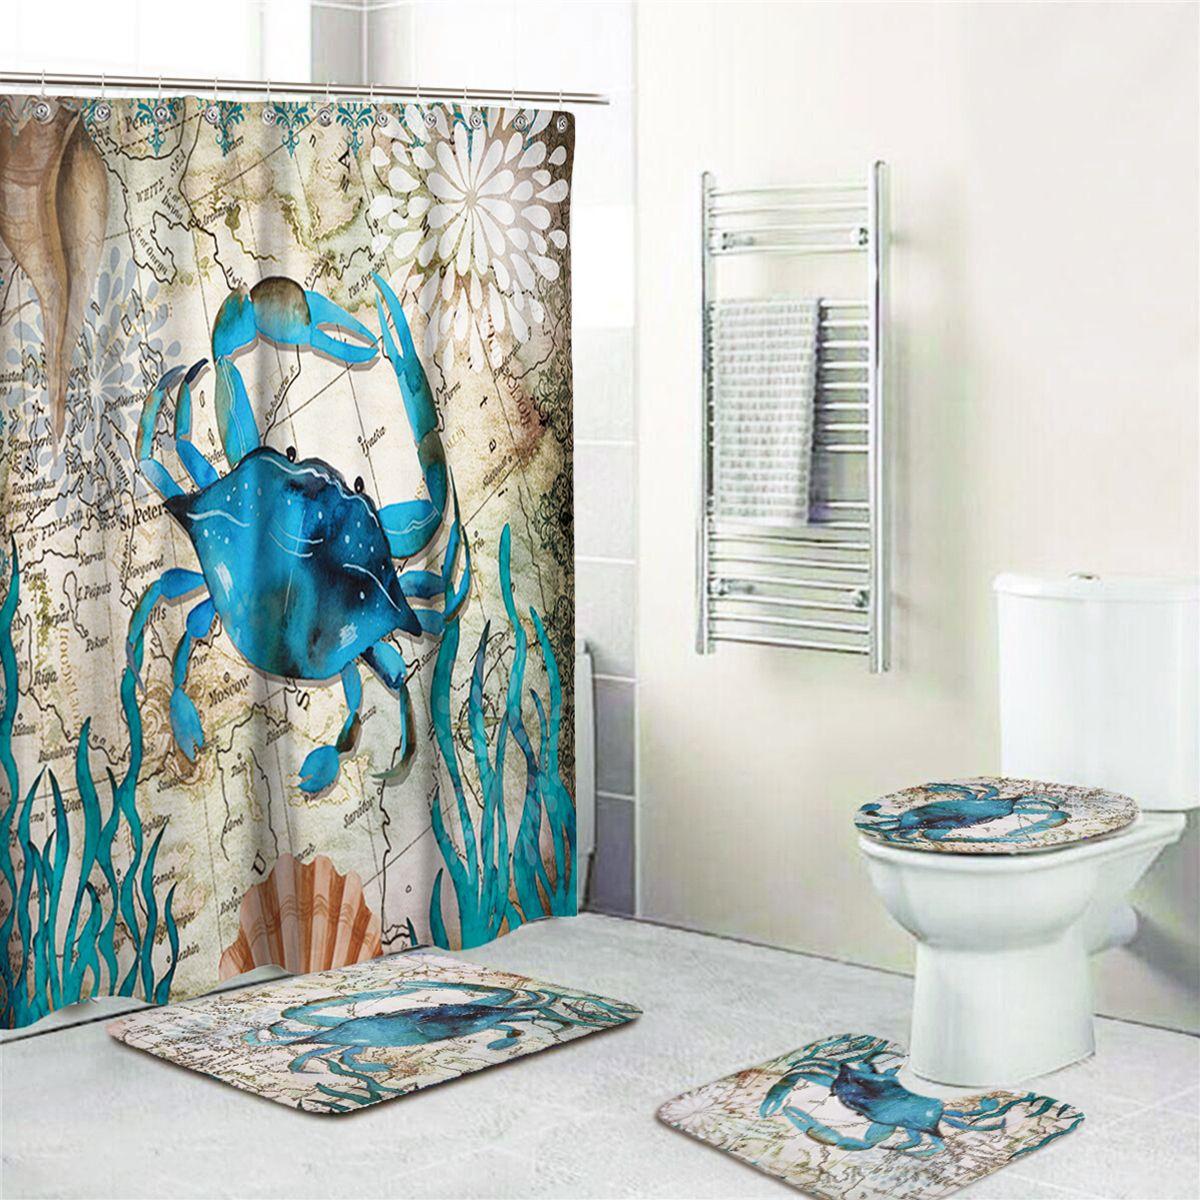 Us 12 50 Krabben Druck Badezimmer Duschvorhang Toiletten